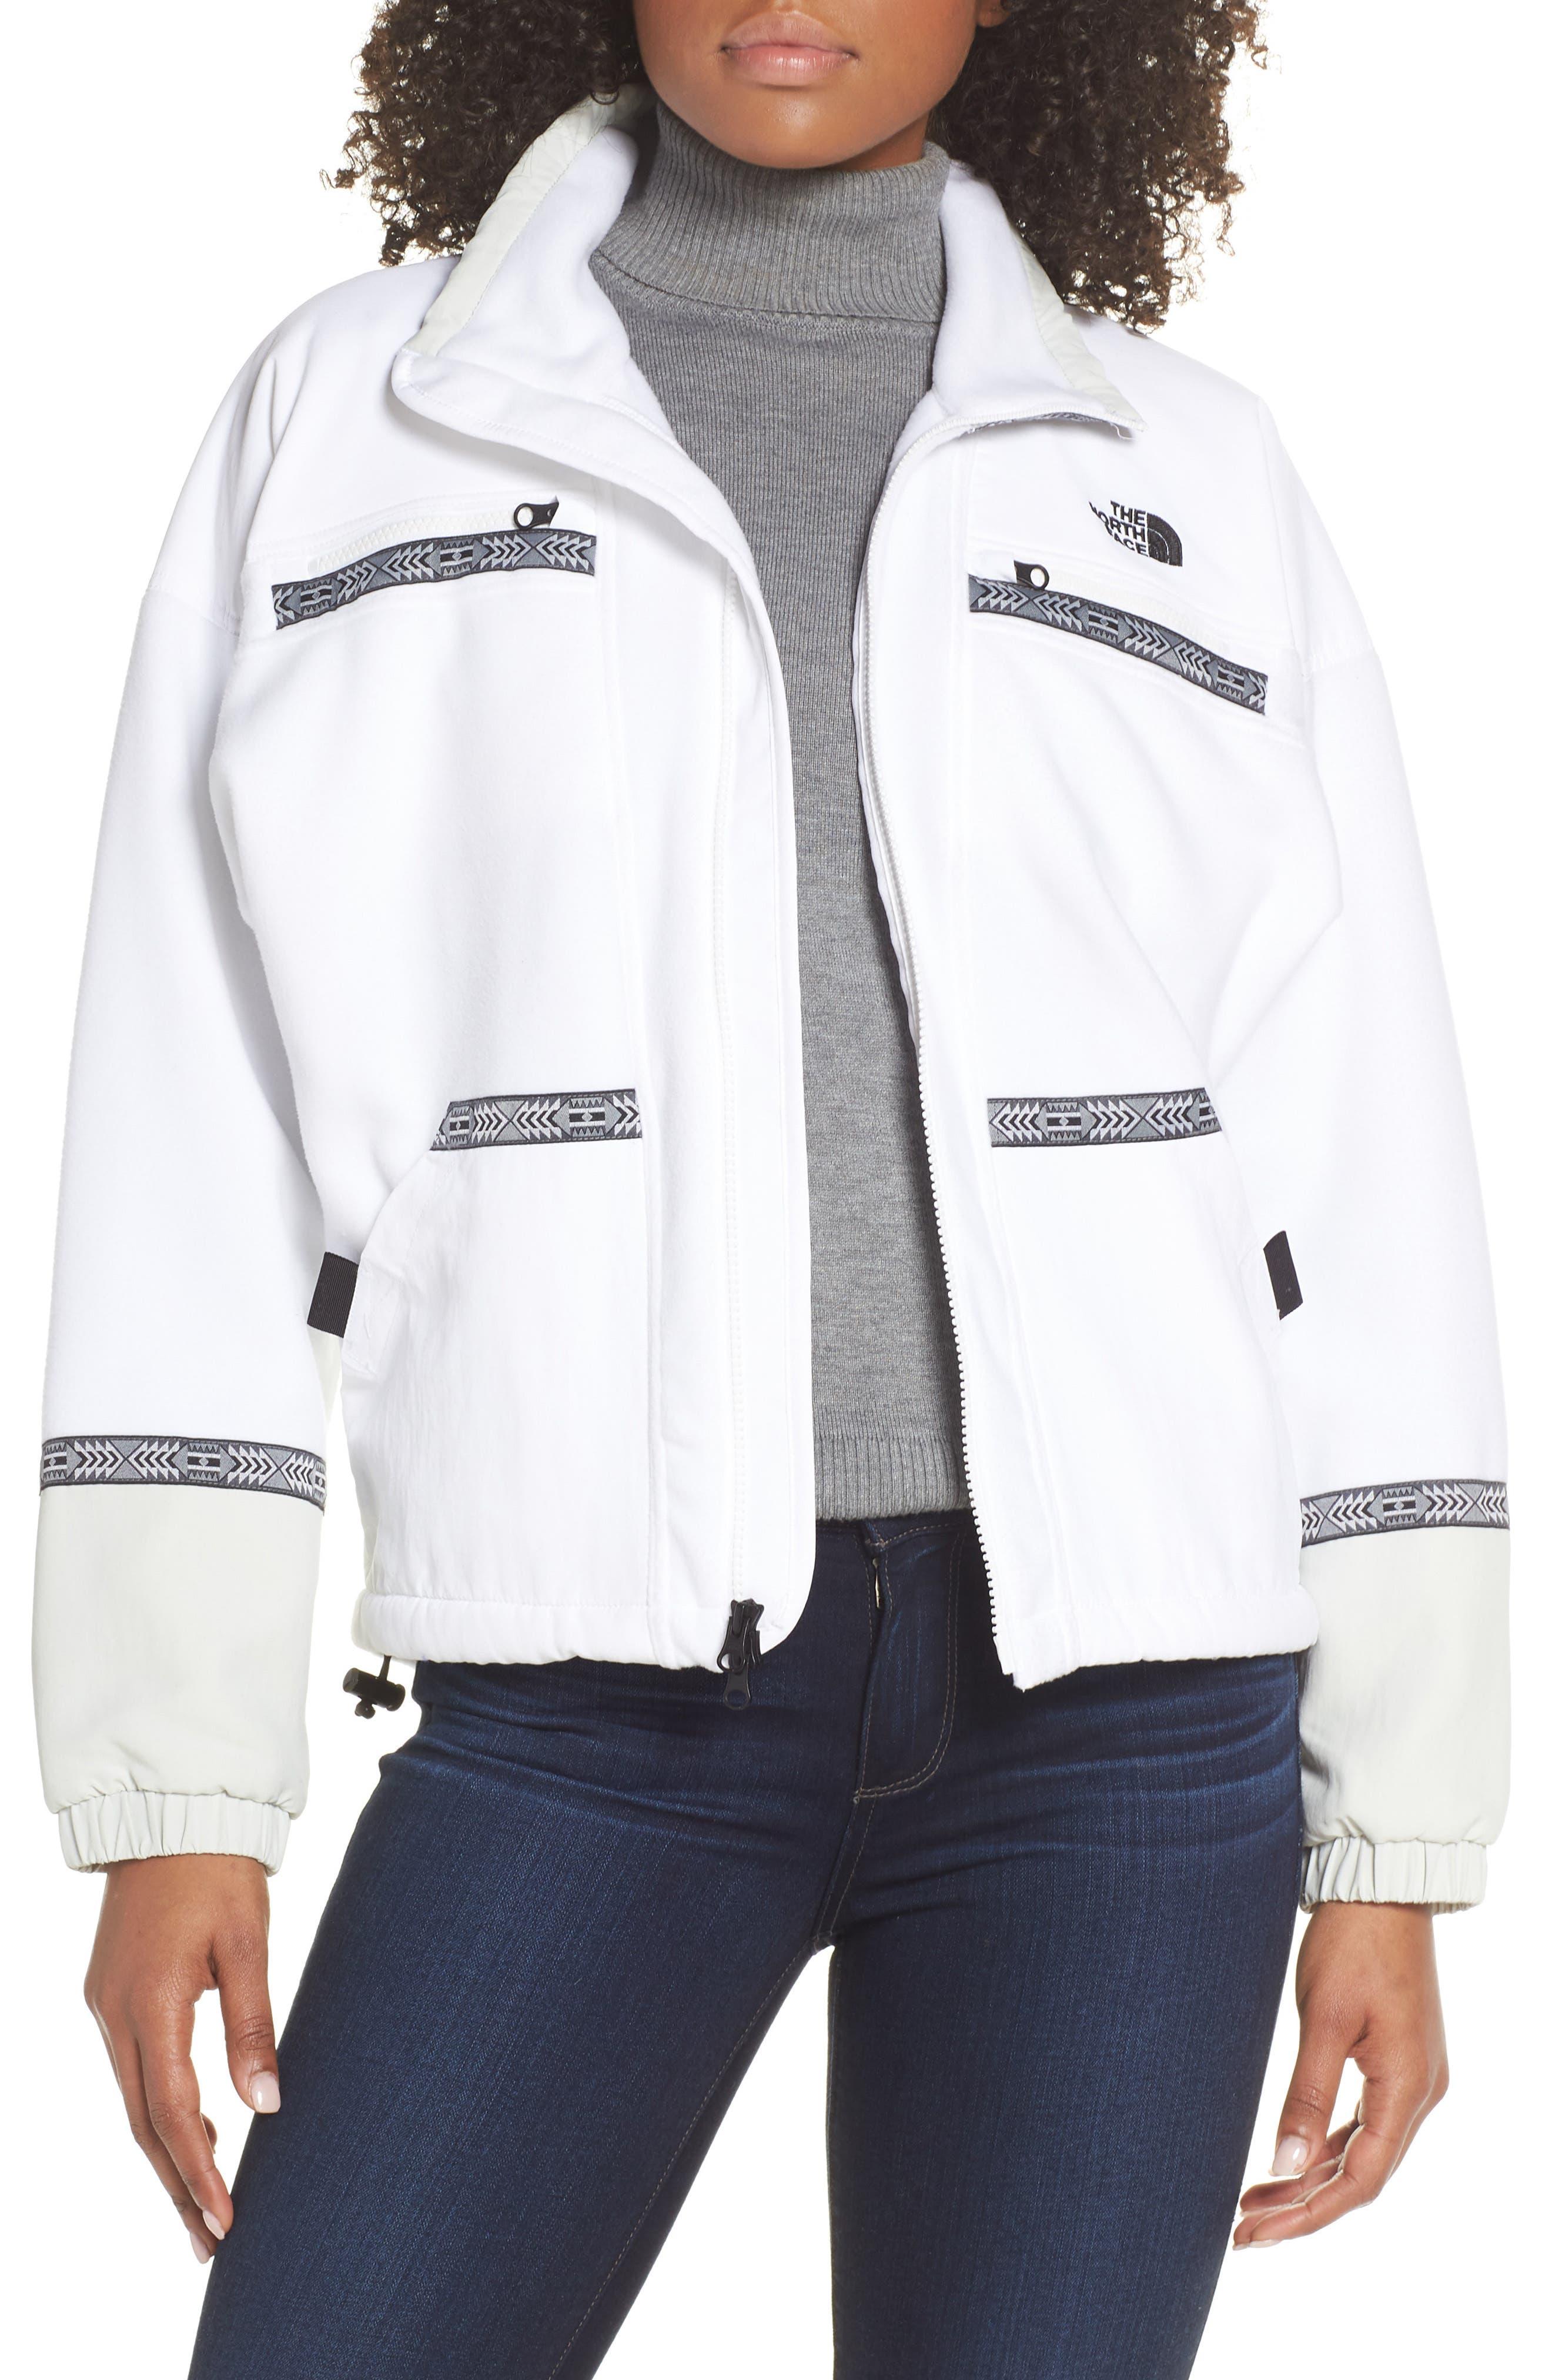 The North Face 92 Rage Fleece Full Zip Jacket, White